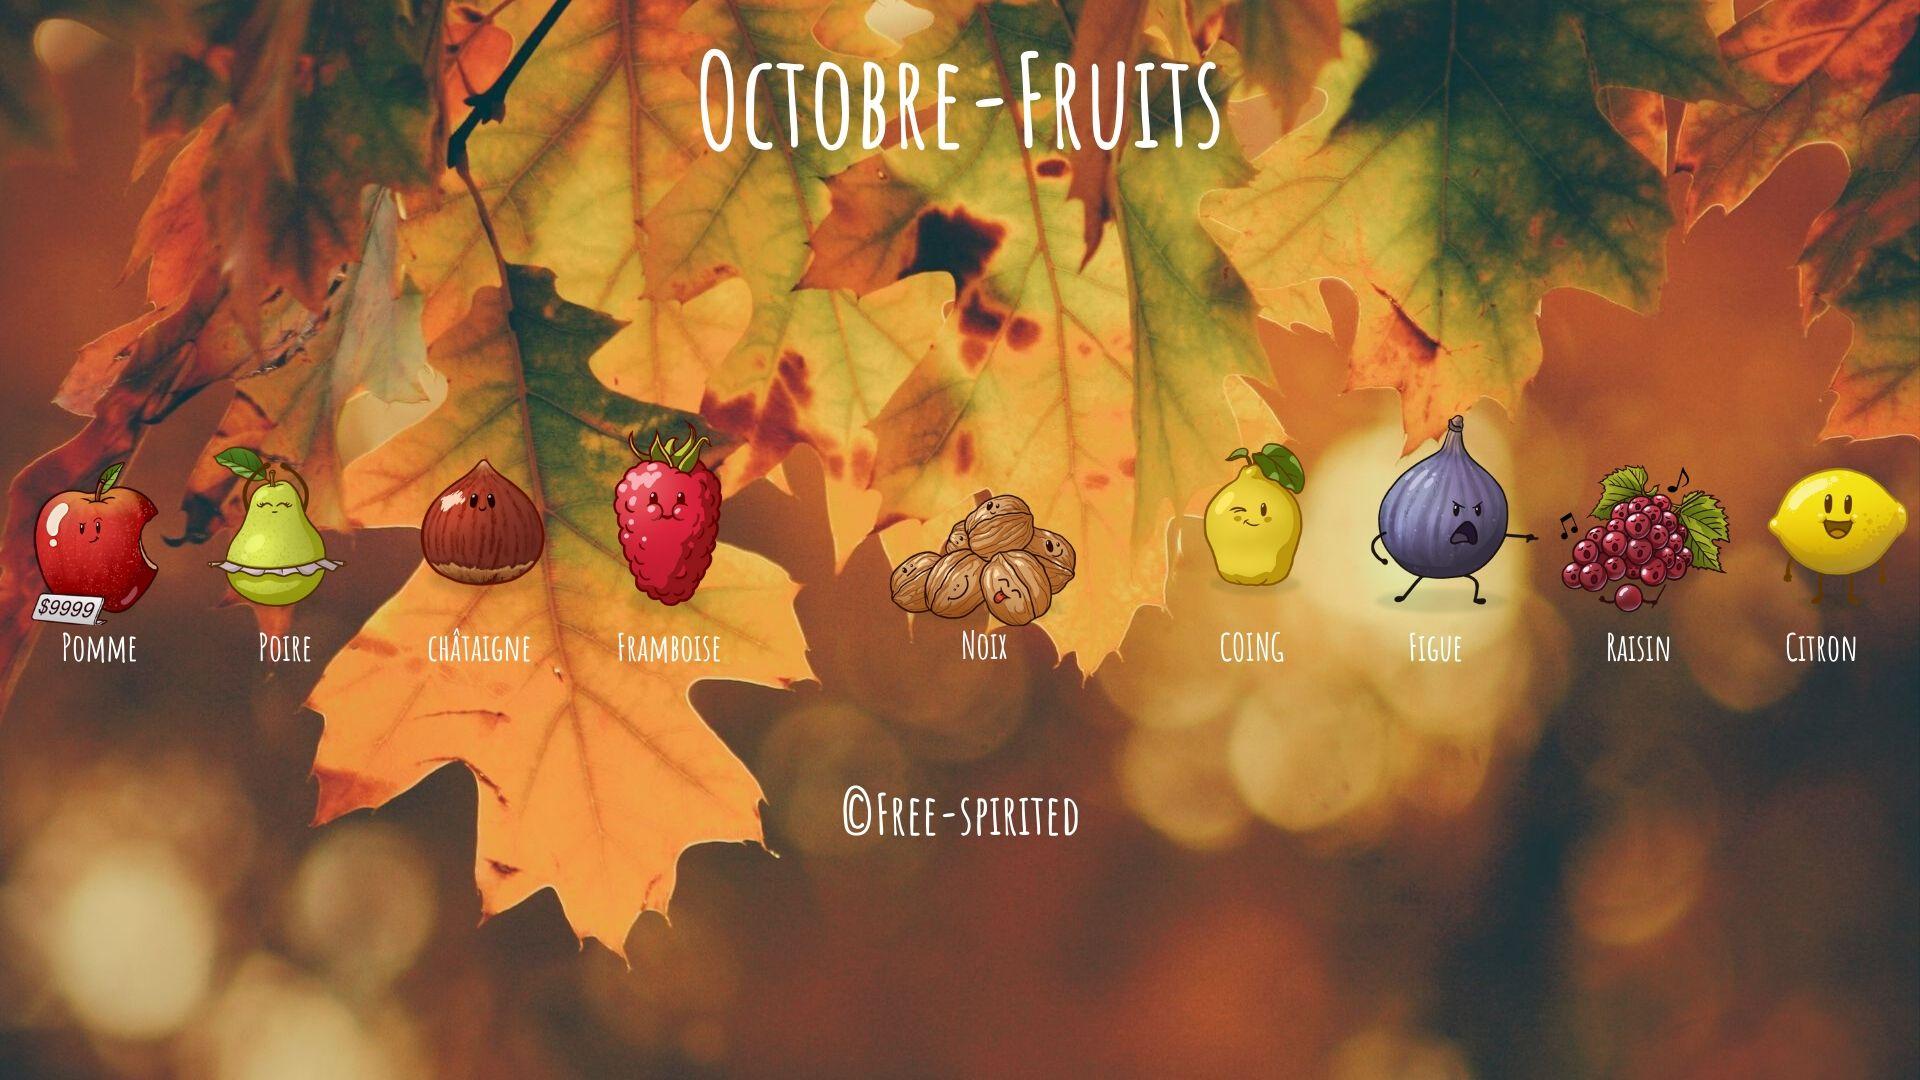 Free-spirited-Octobre-Fruits